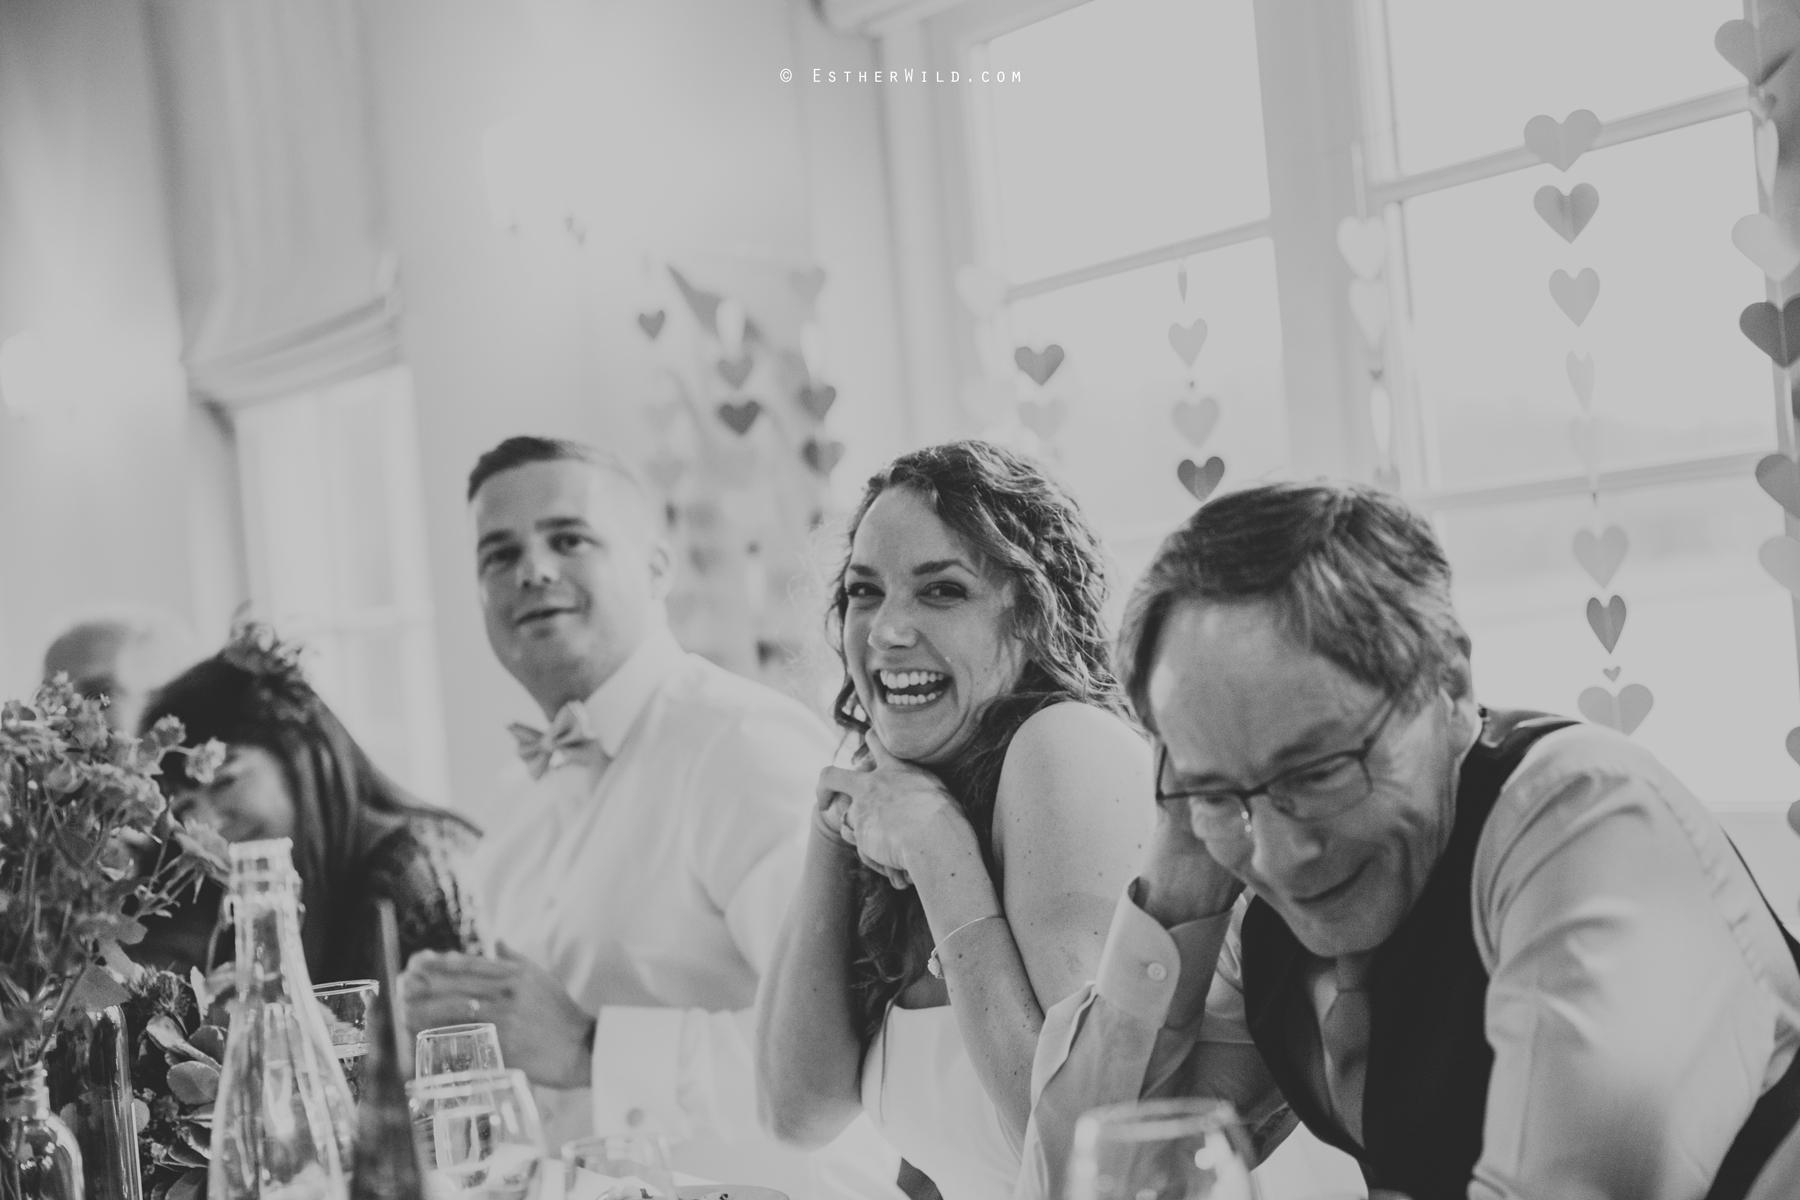 The_BoatHouse_Wedding_Venue_Ormesby_Norfolk_Broads_Boat_Wedding_Photography_Esther_Wild_Photographer_IMG_2275-2.jpg